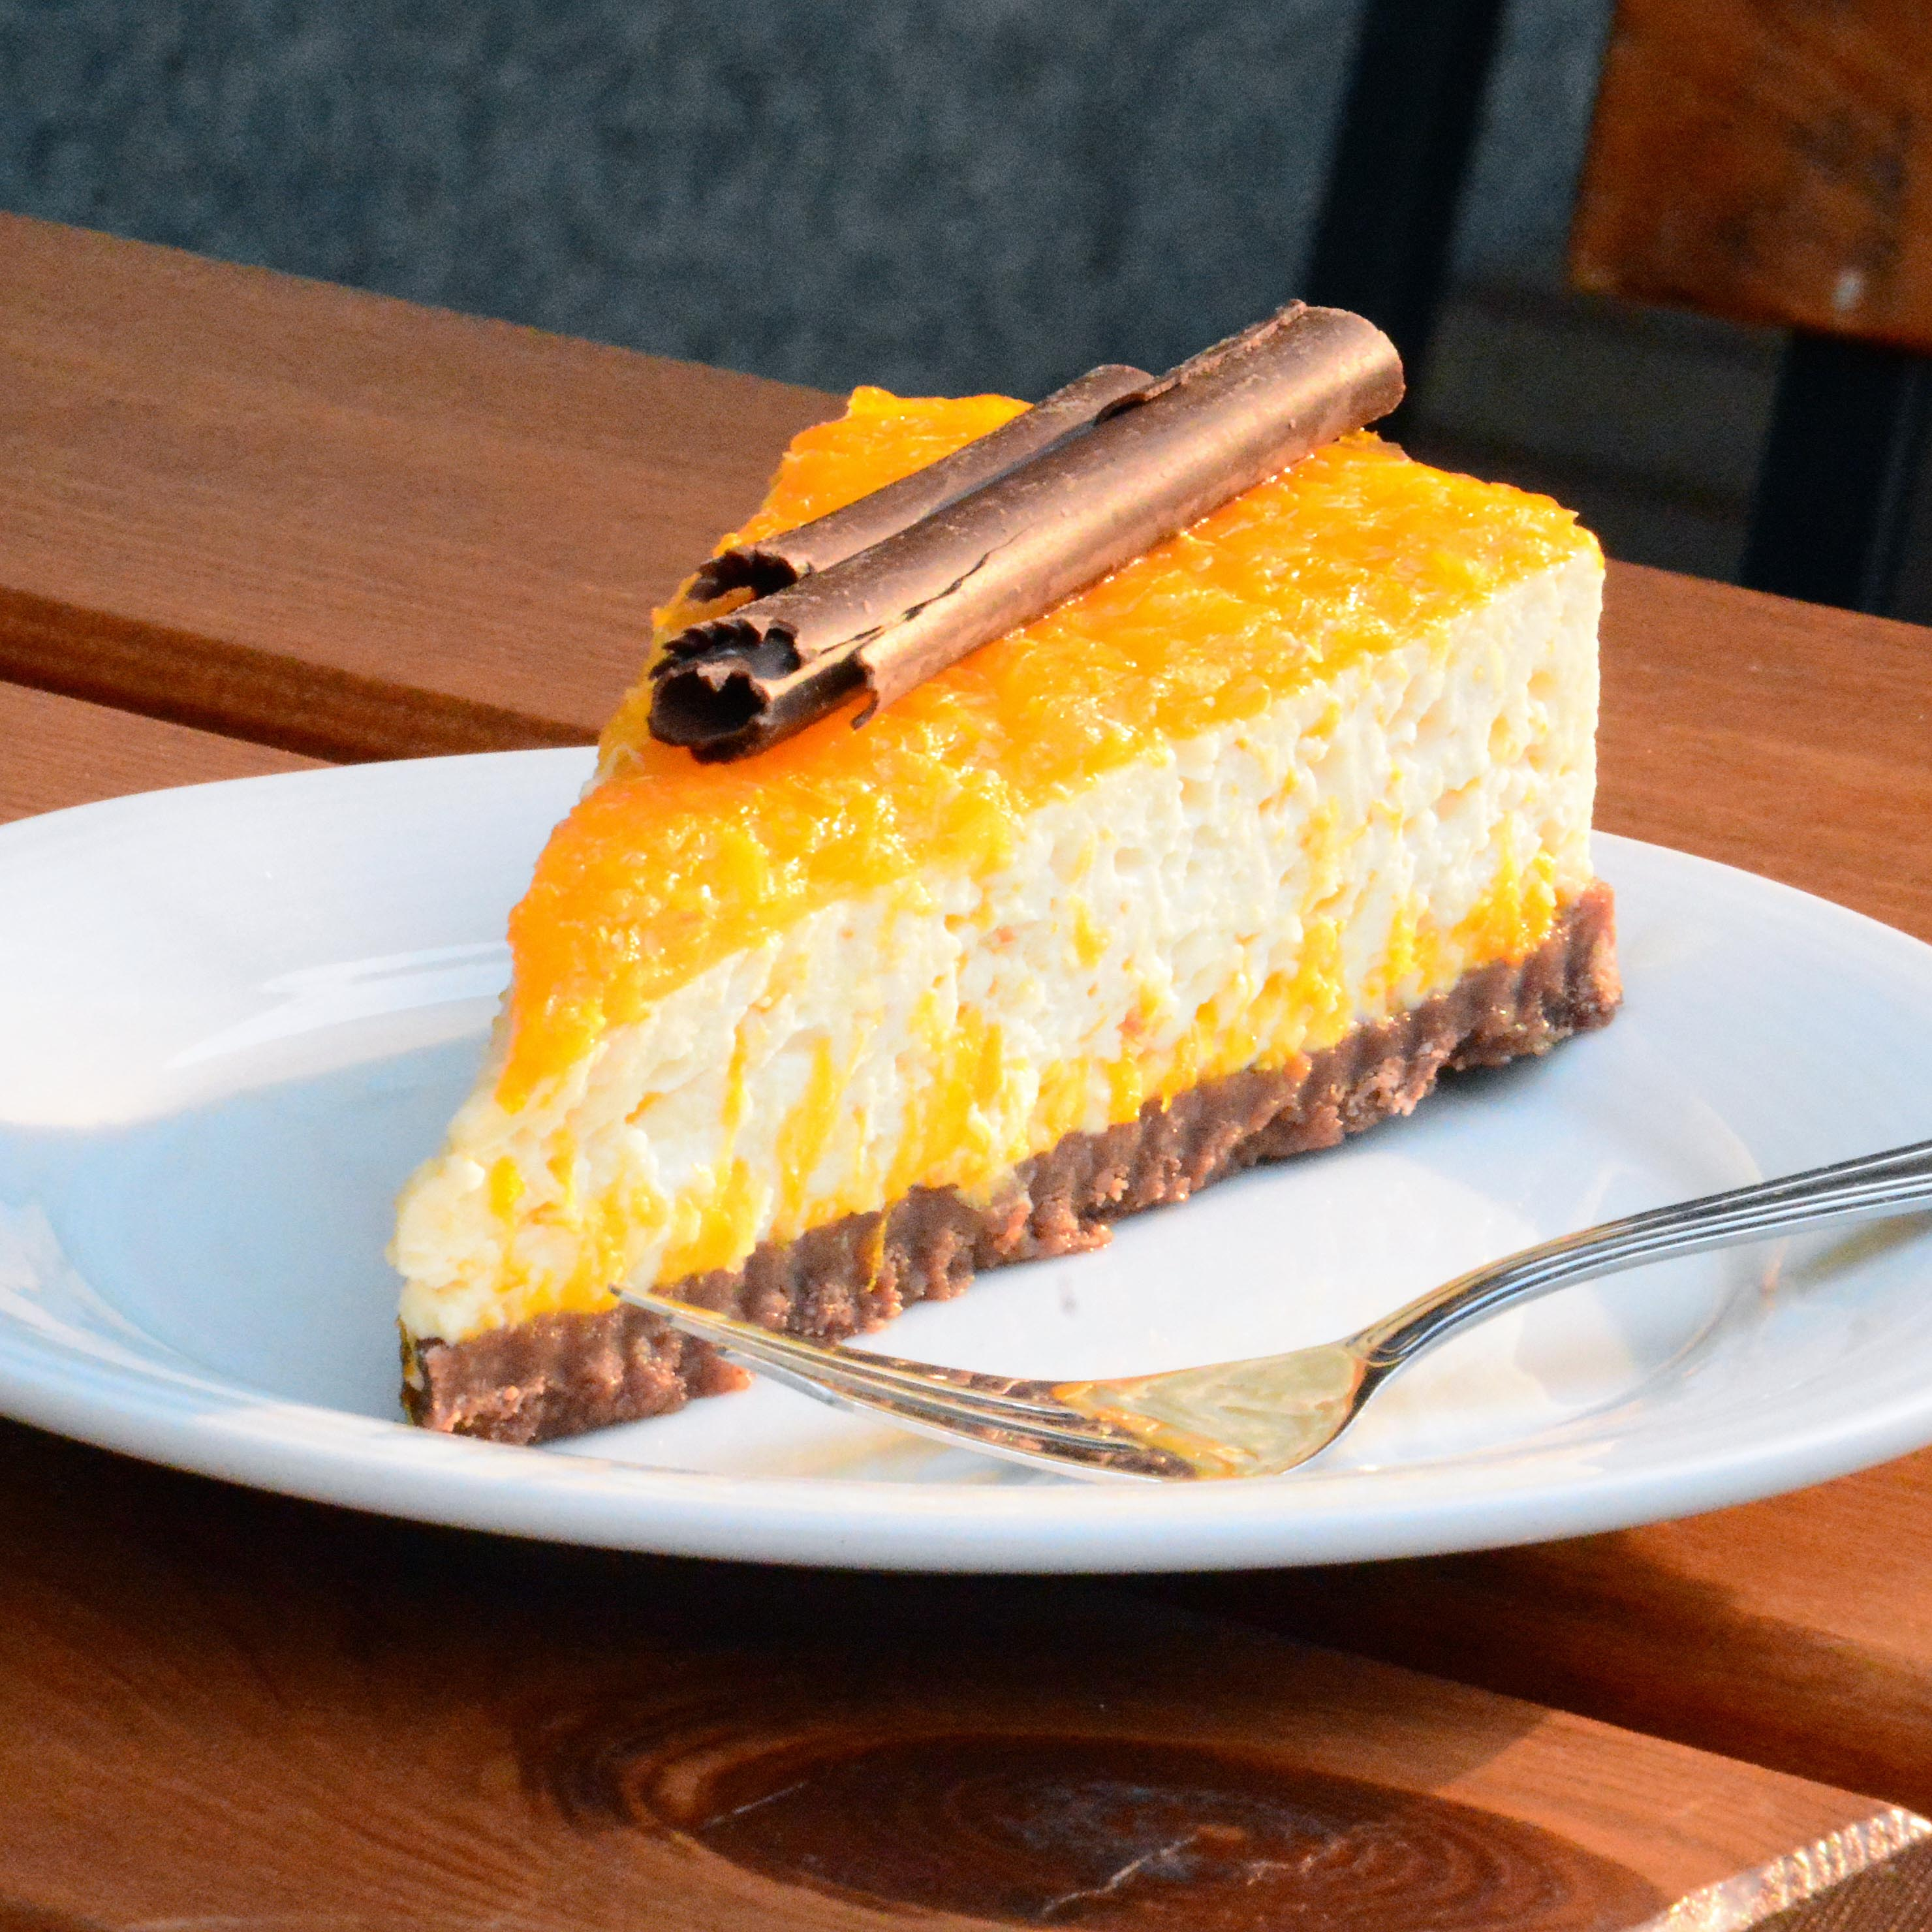 Novinka: Mandarinkový cheesecake